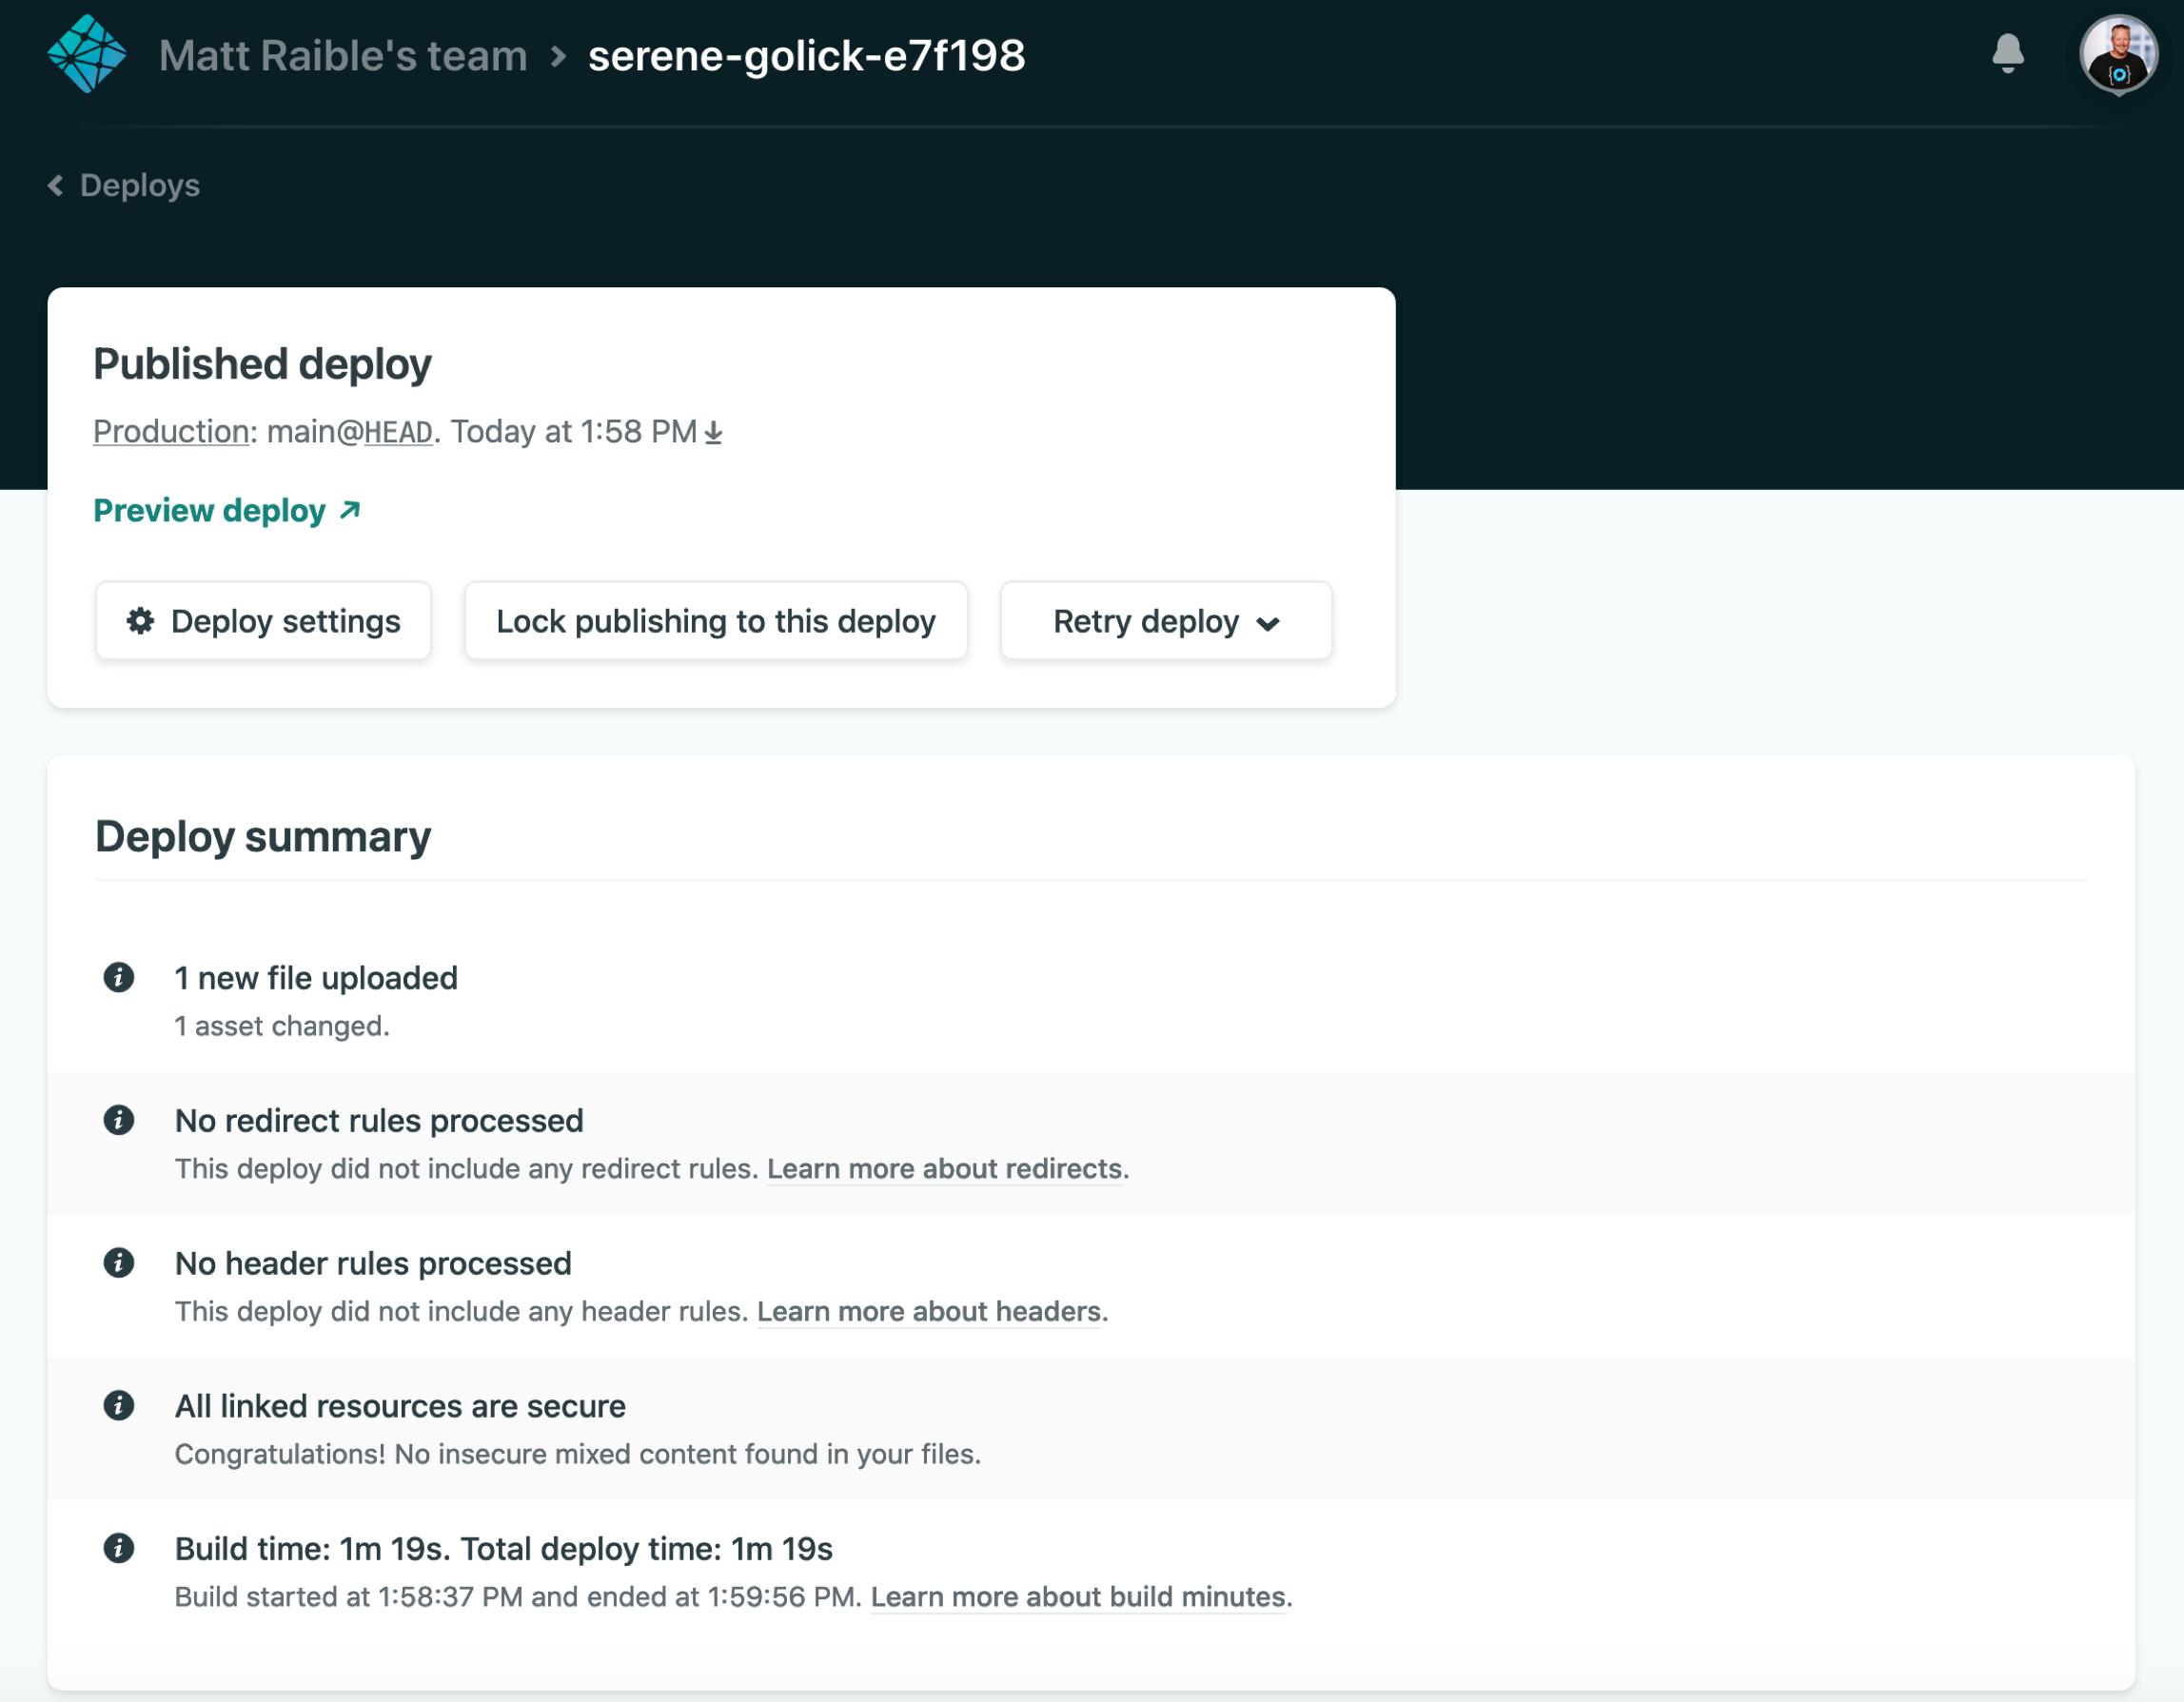 blog/gatsby-netlify-okta/netlify-deploy-summary.png